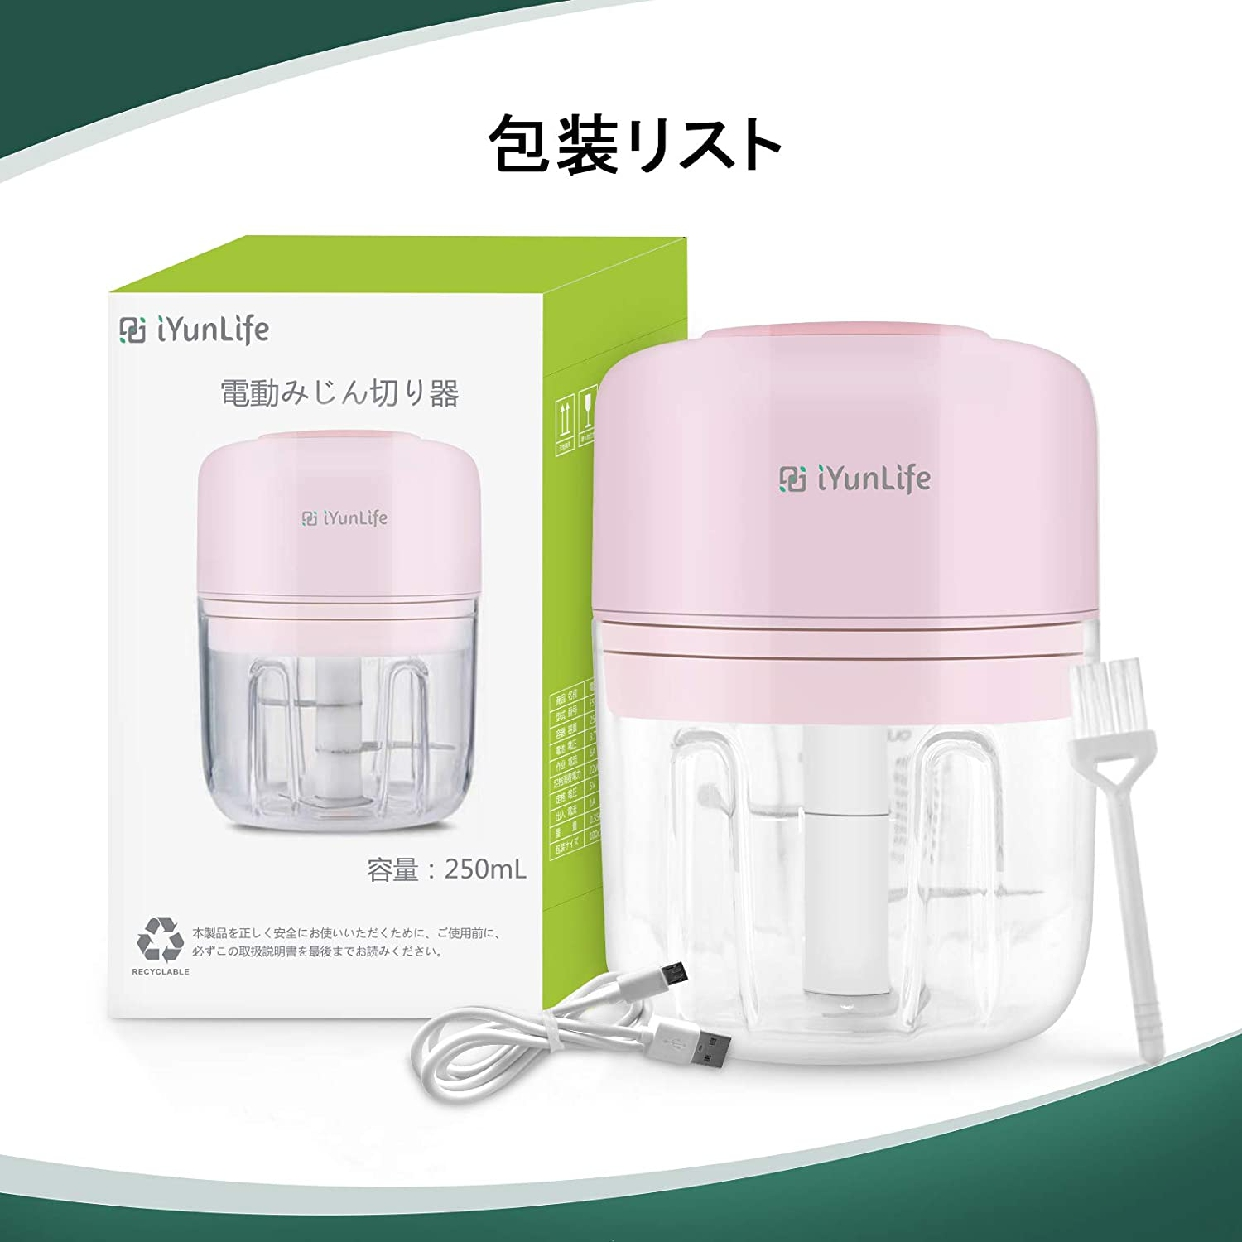 iYunLife(アイユンライフ) みじん切り器 USB充電式 掃除ブラシ付き 日本語取扱説明書付属 (ピンク)の商品画像7